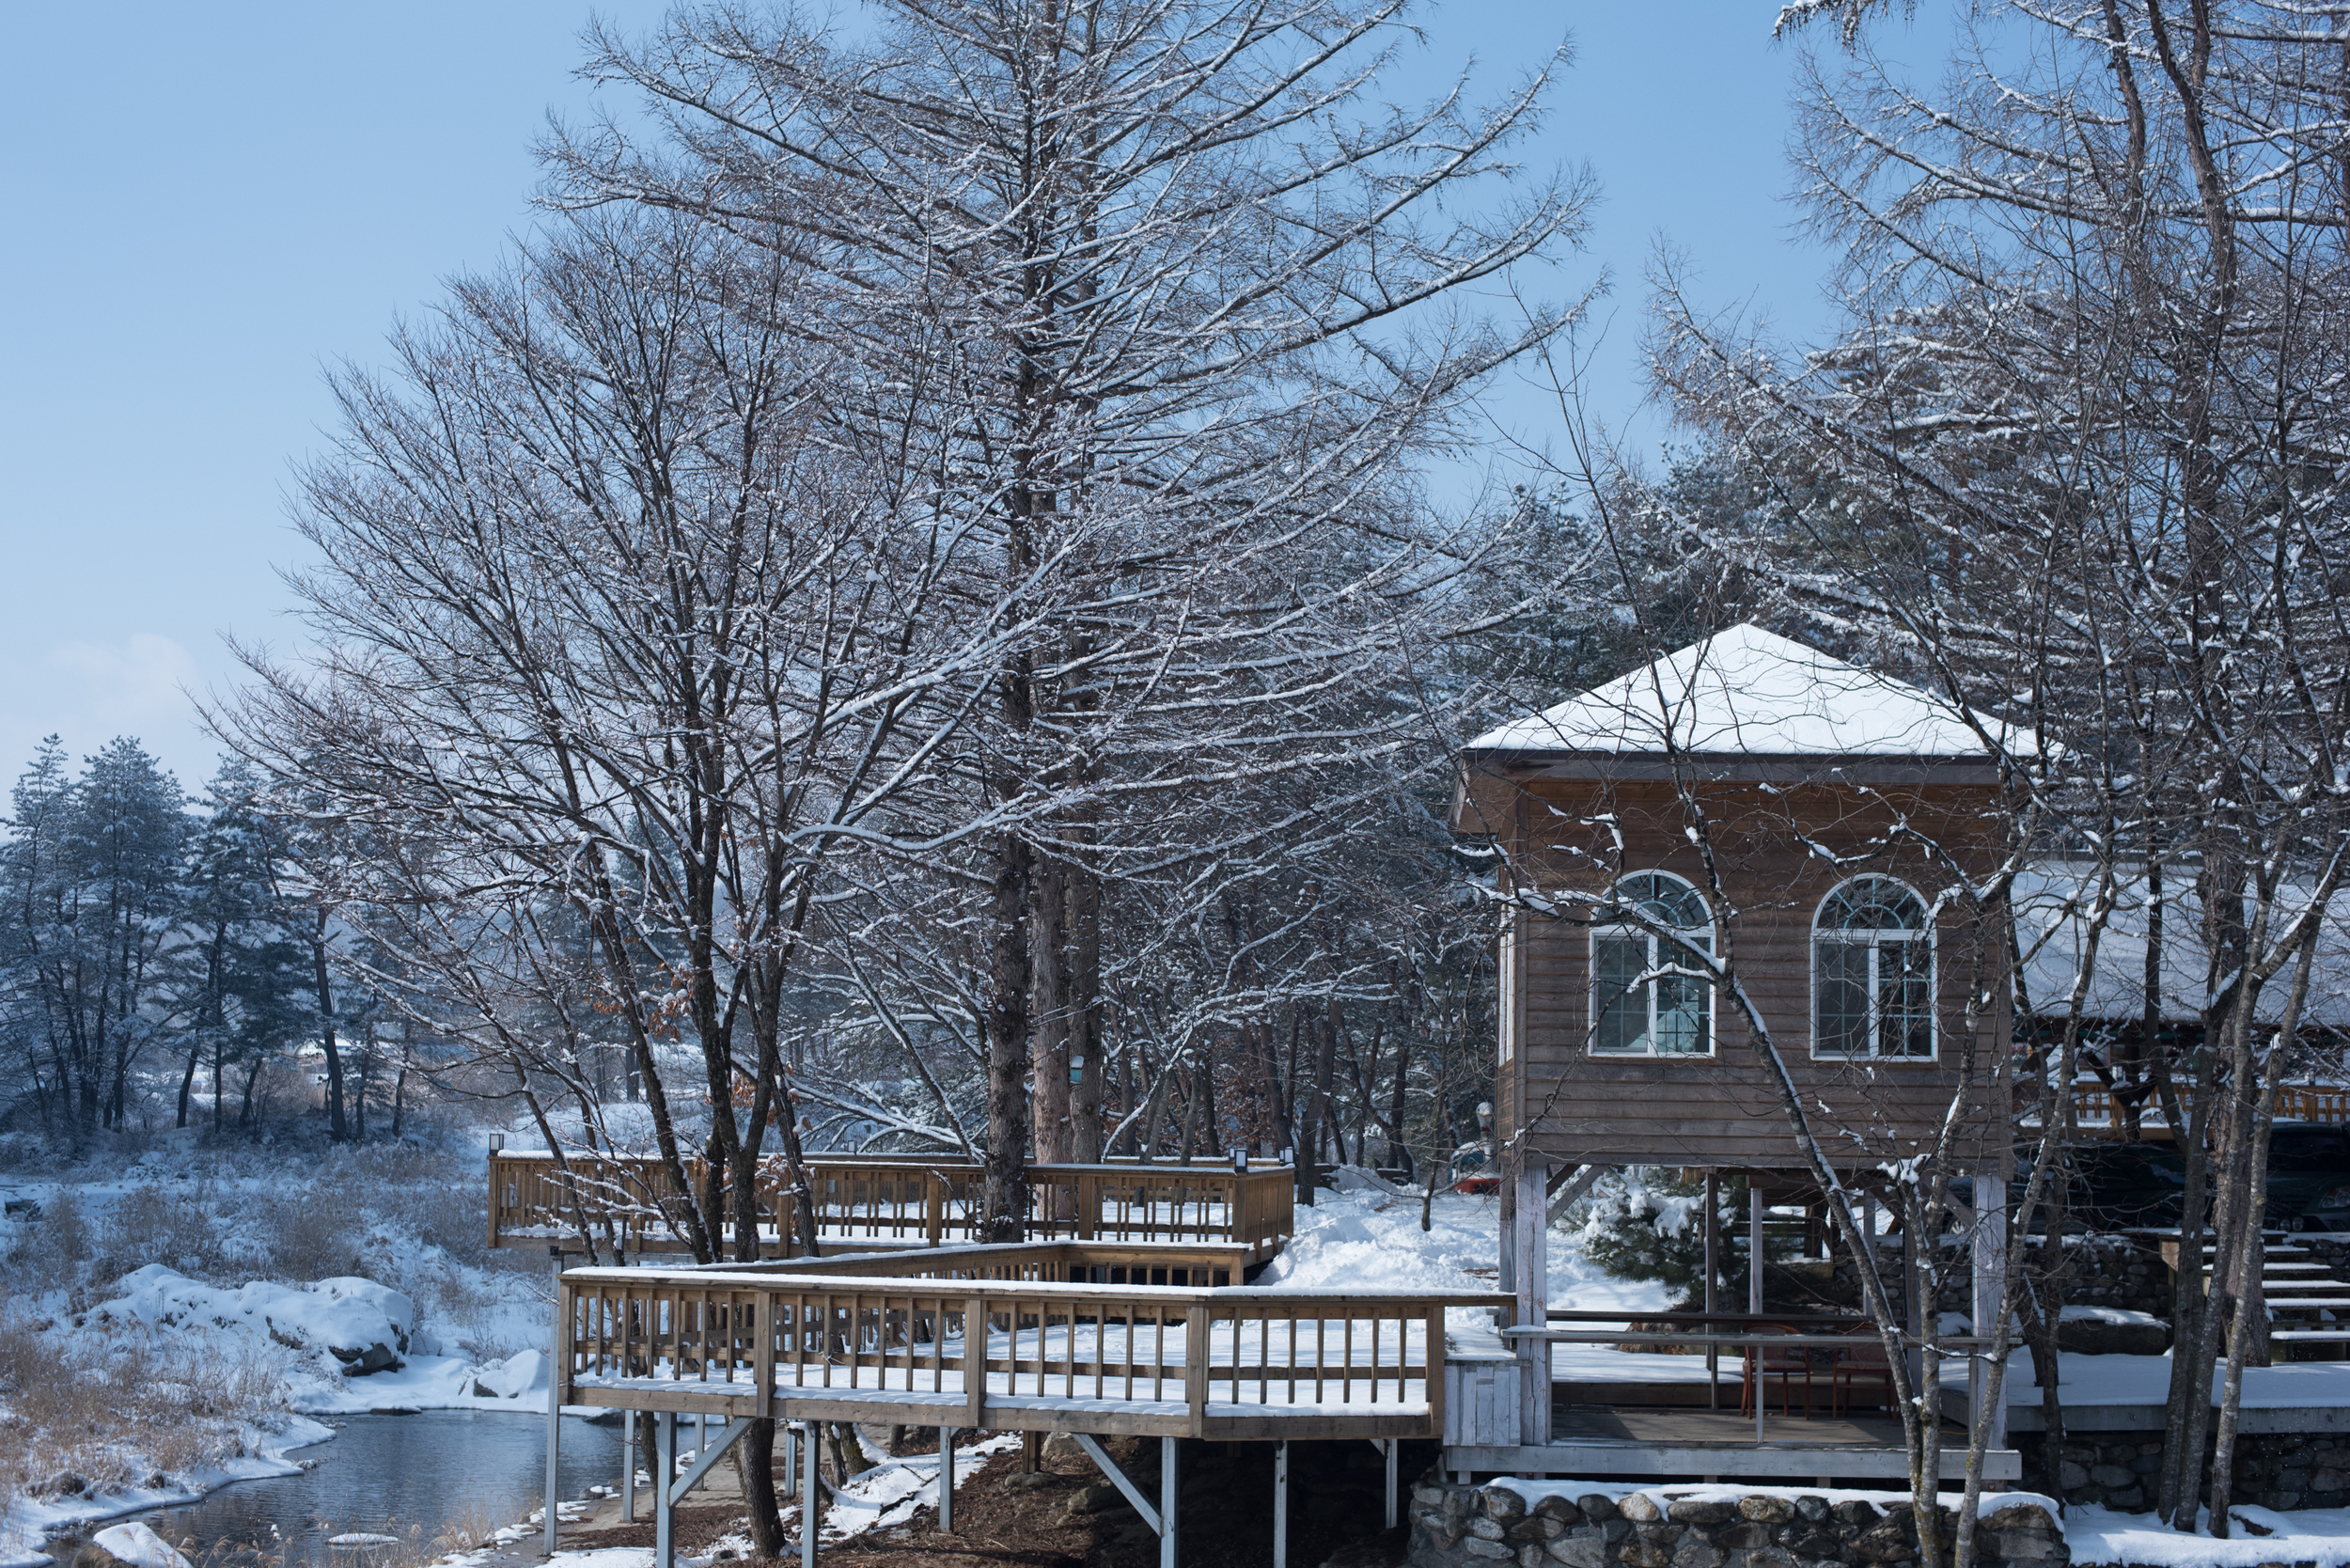 ArtInIslandPyeongChangDogFriendly Wooden Cabin Korea (232 of 258).JPG